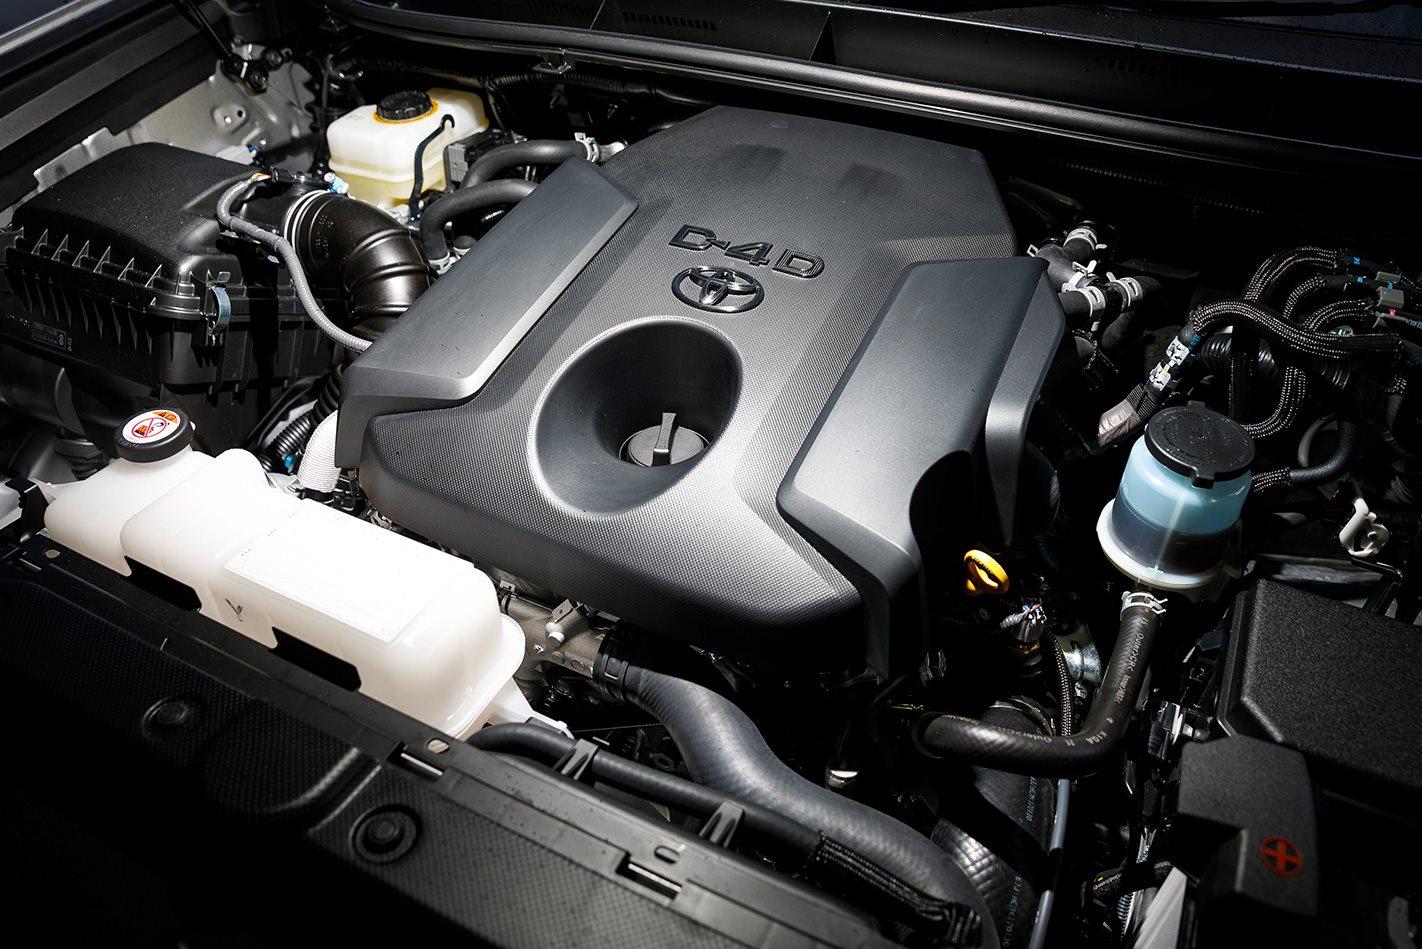 2017-Toyota-LandCruiser-Prado-engine.jpg